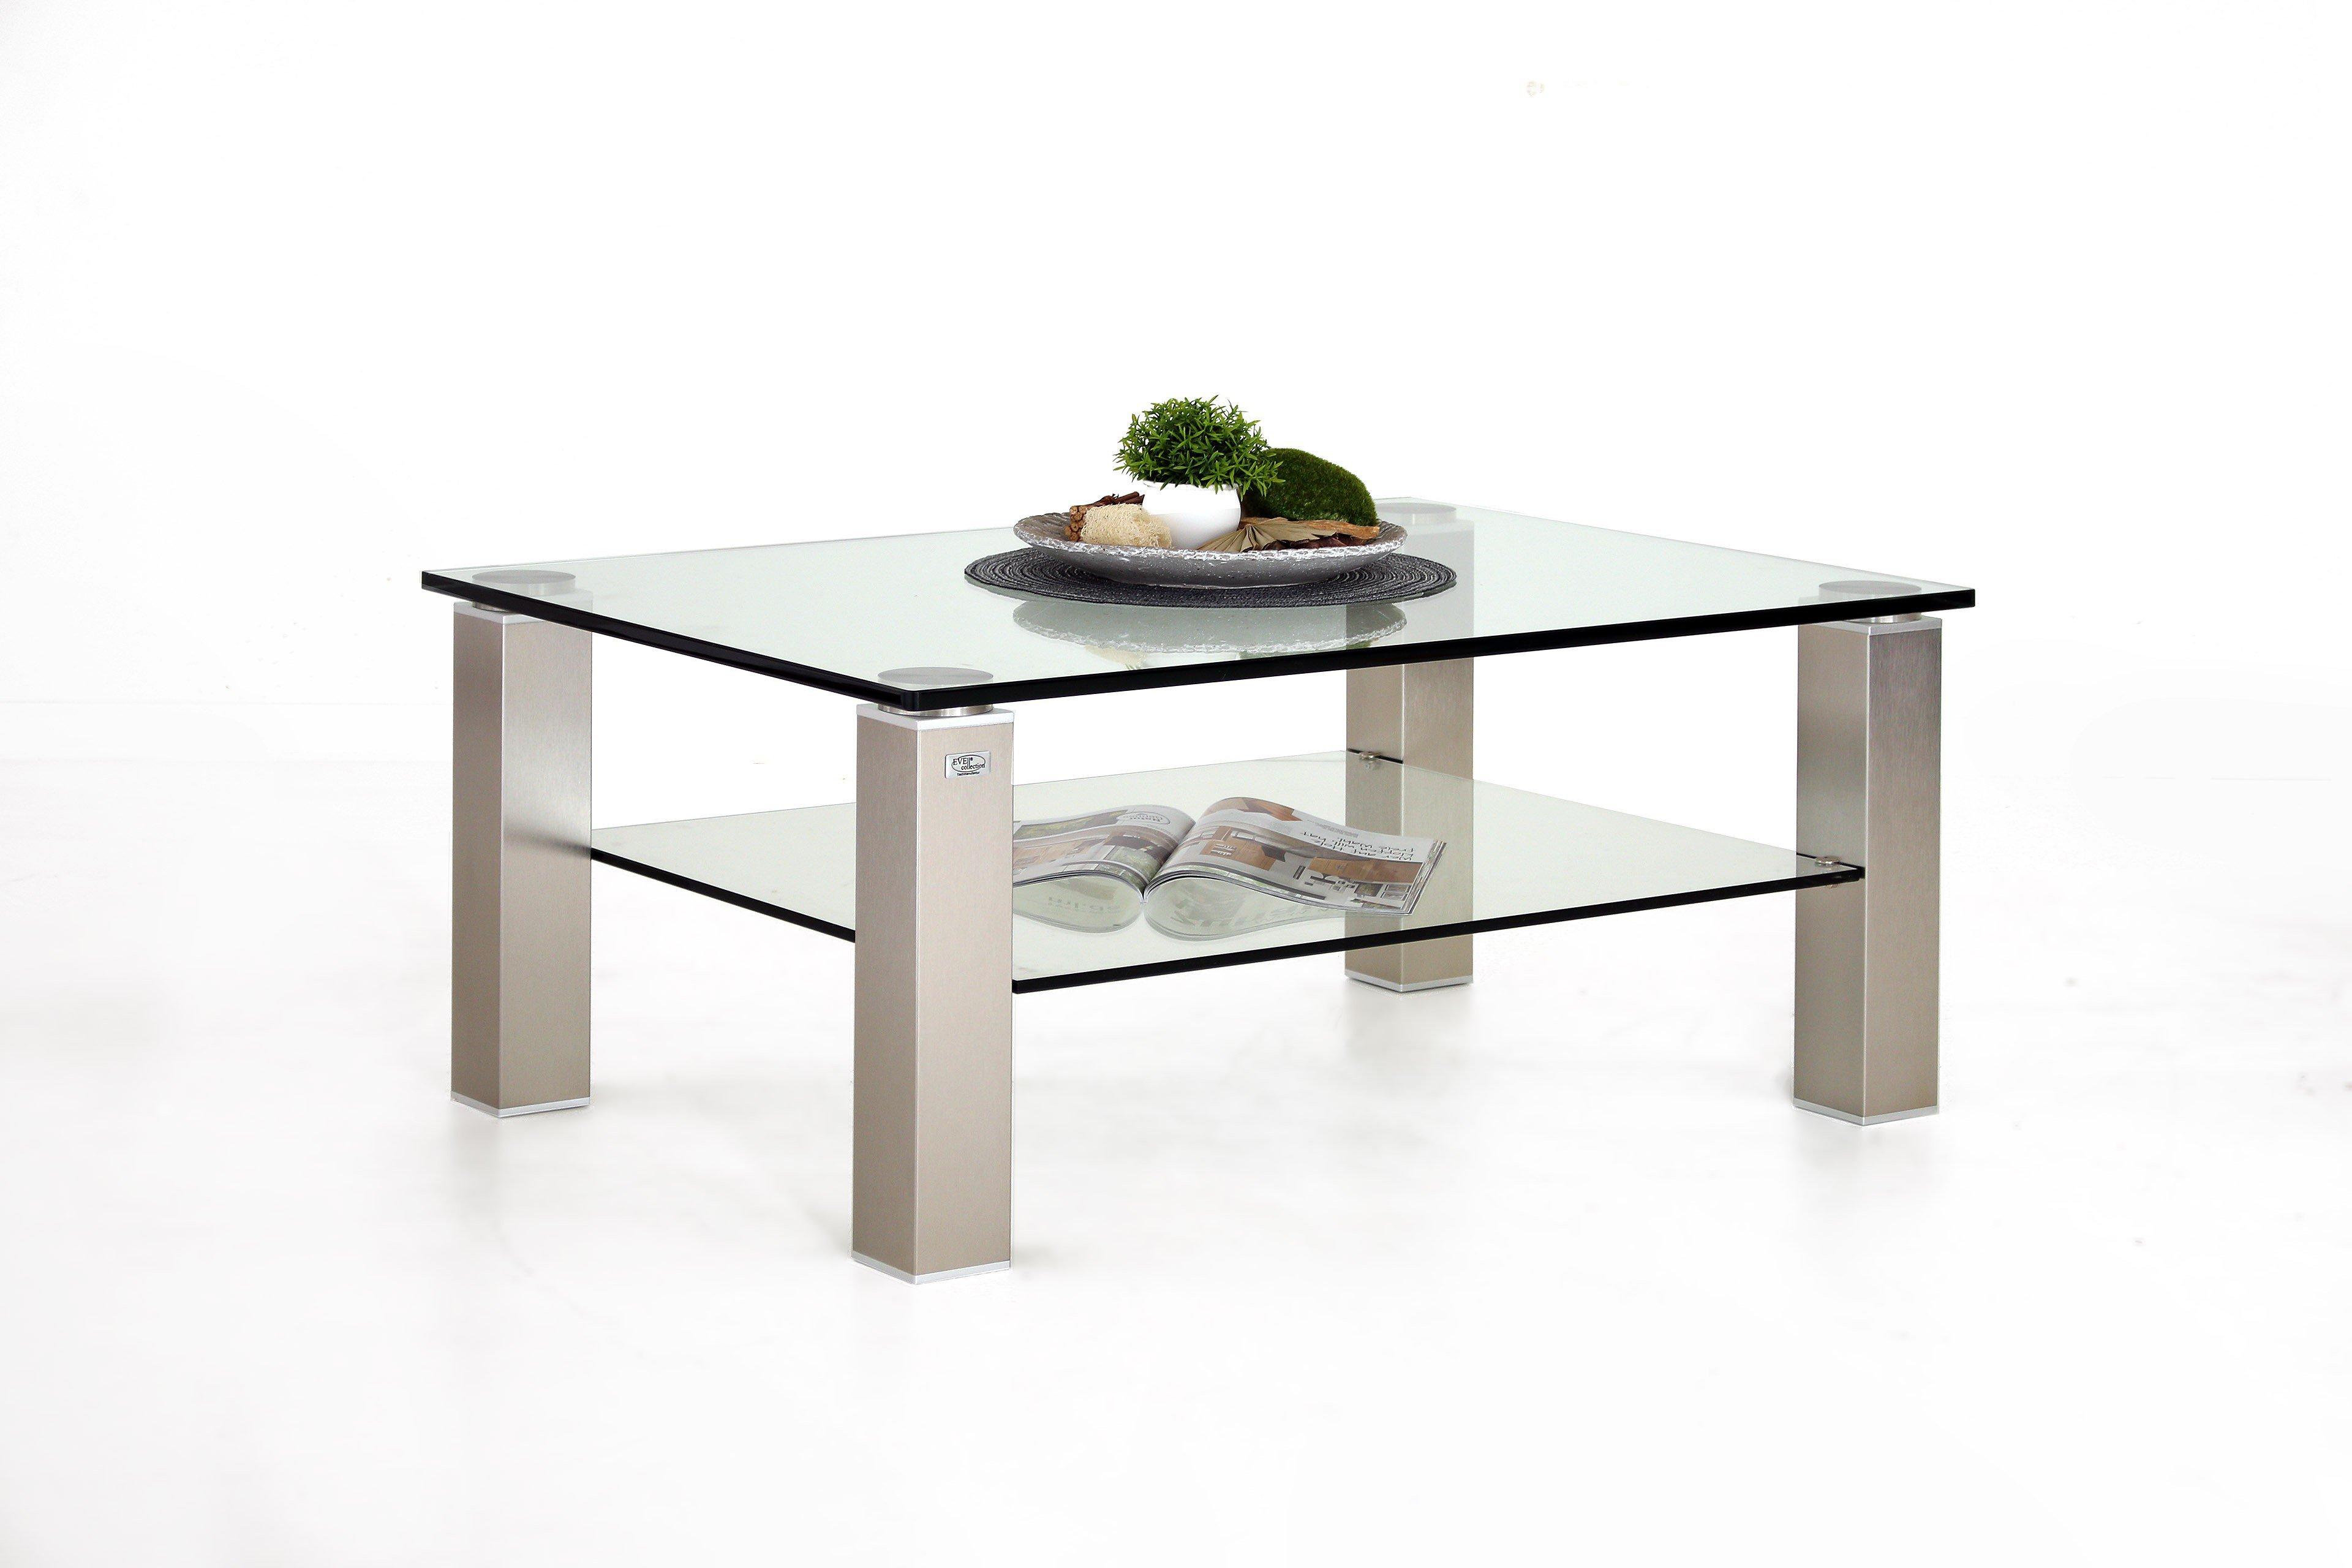 collection c couchtisch bestseller shop f r m bel und. Black Bedroom Furniture Sets. Home Design Ideas